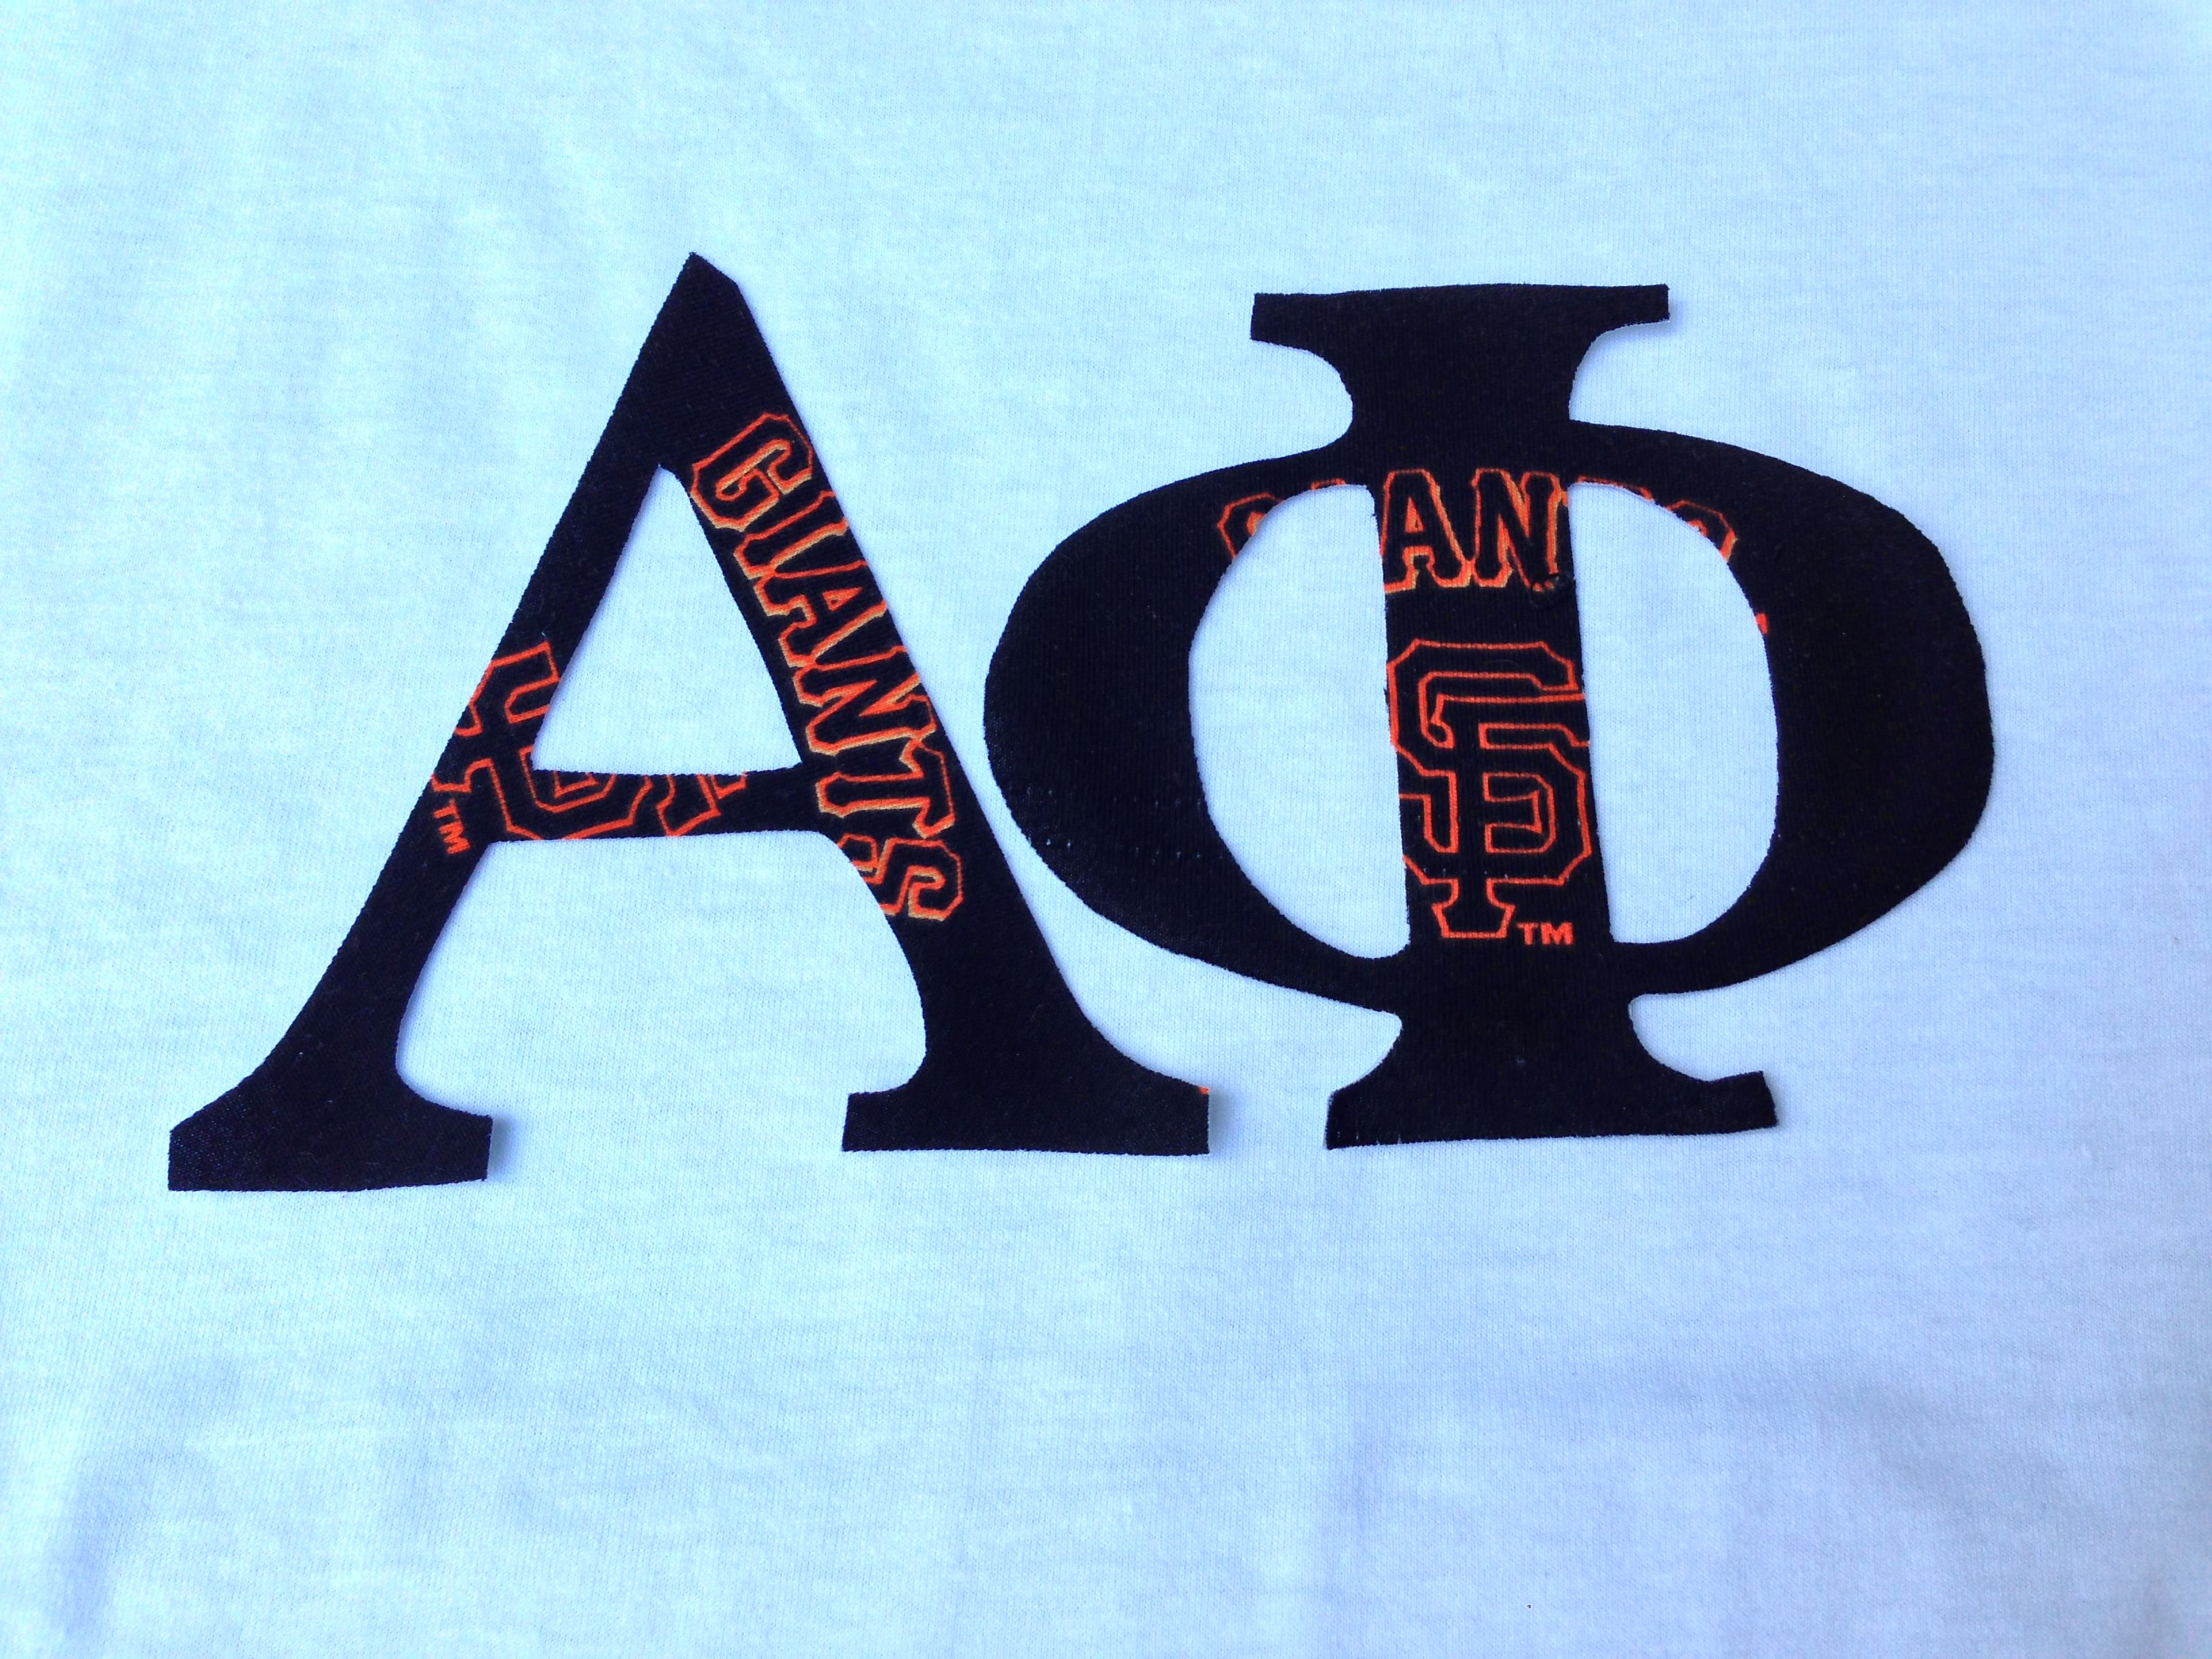 alpha chi omega letters san francisco giants letters baseball themed sorority letters greek letters pinterest san francisco giants chi omega and